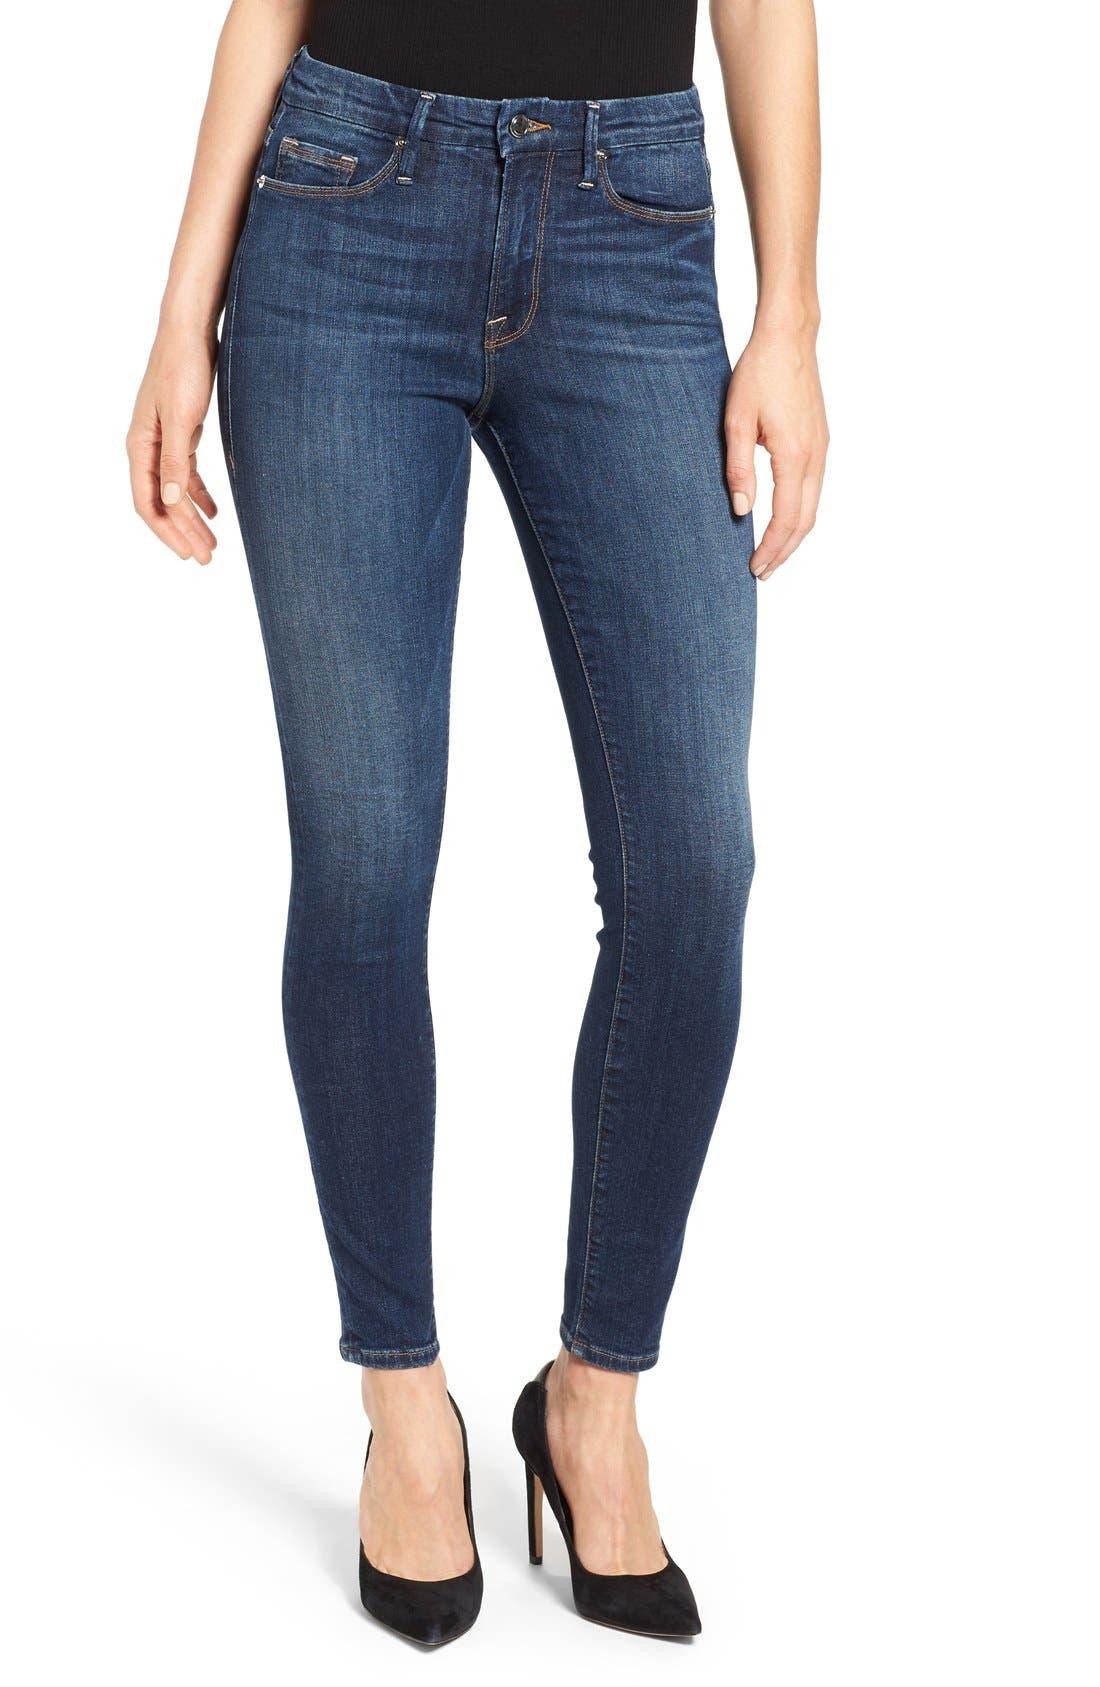 Alternate Image 1 Selected - Good American Good Legs High Rise Skinny Jeans (Blue 004)